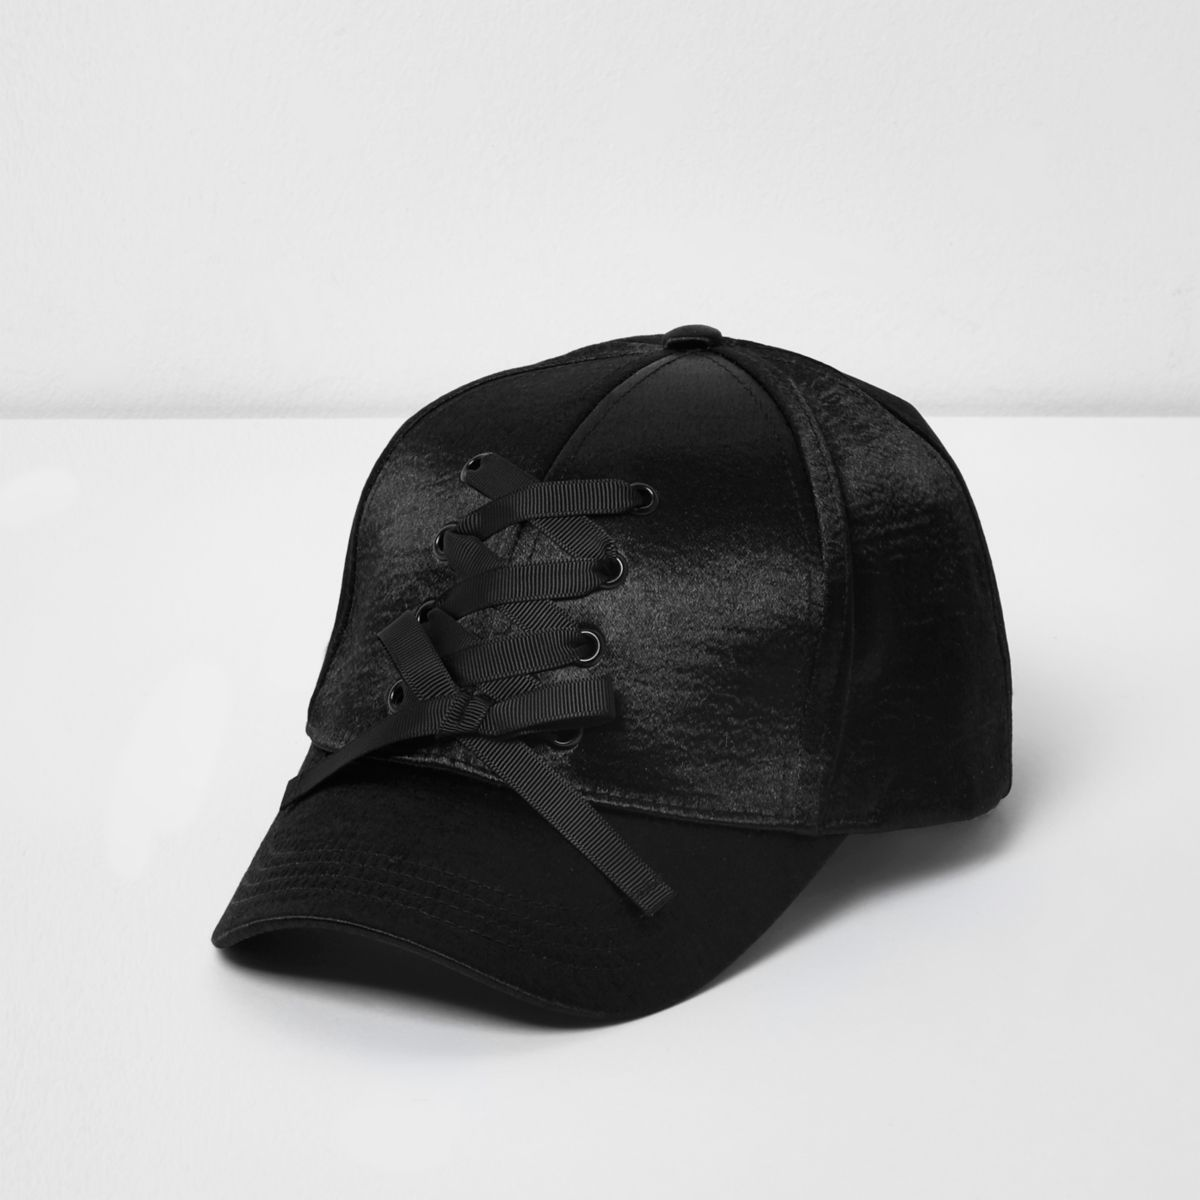 Girls black satin lace-up baseball cap